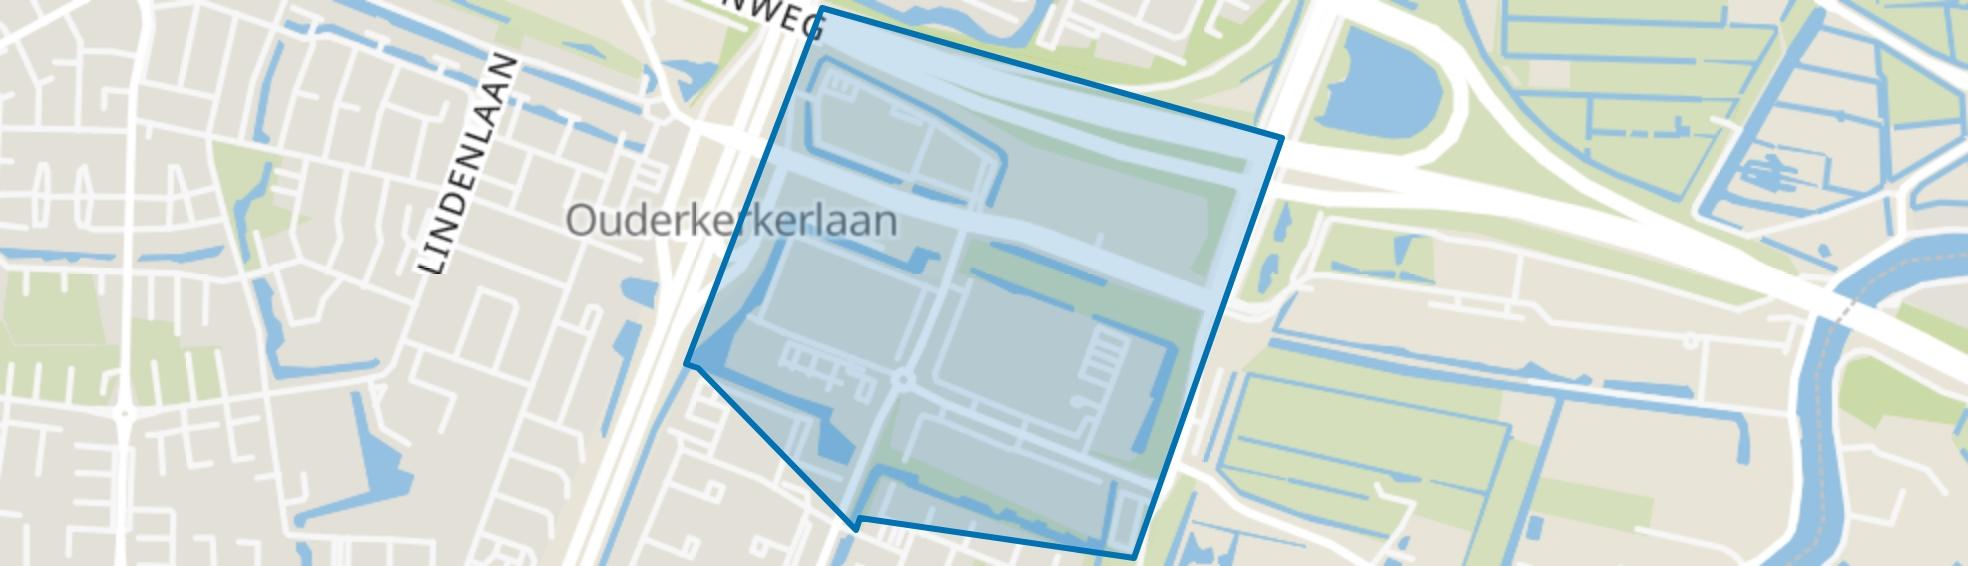 Langerhuize, Amstelveen map